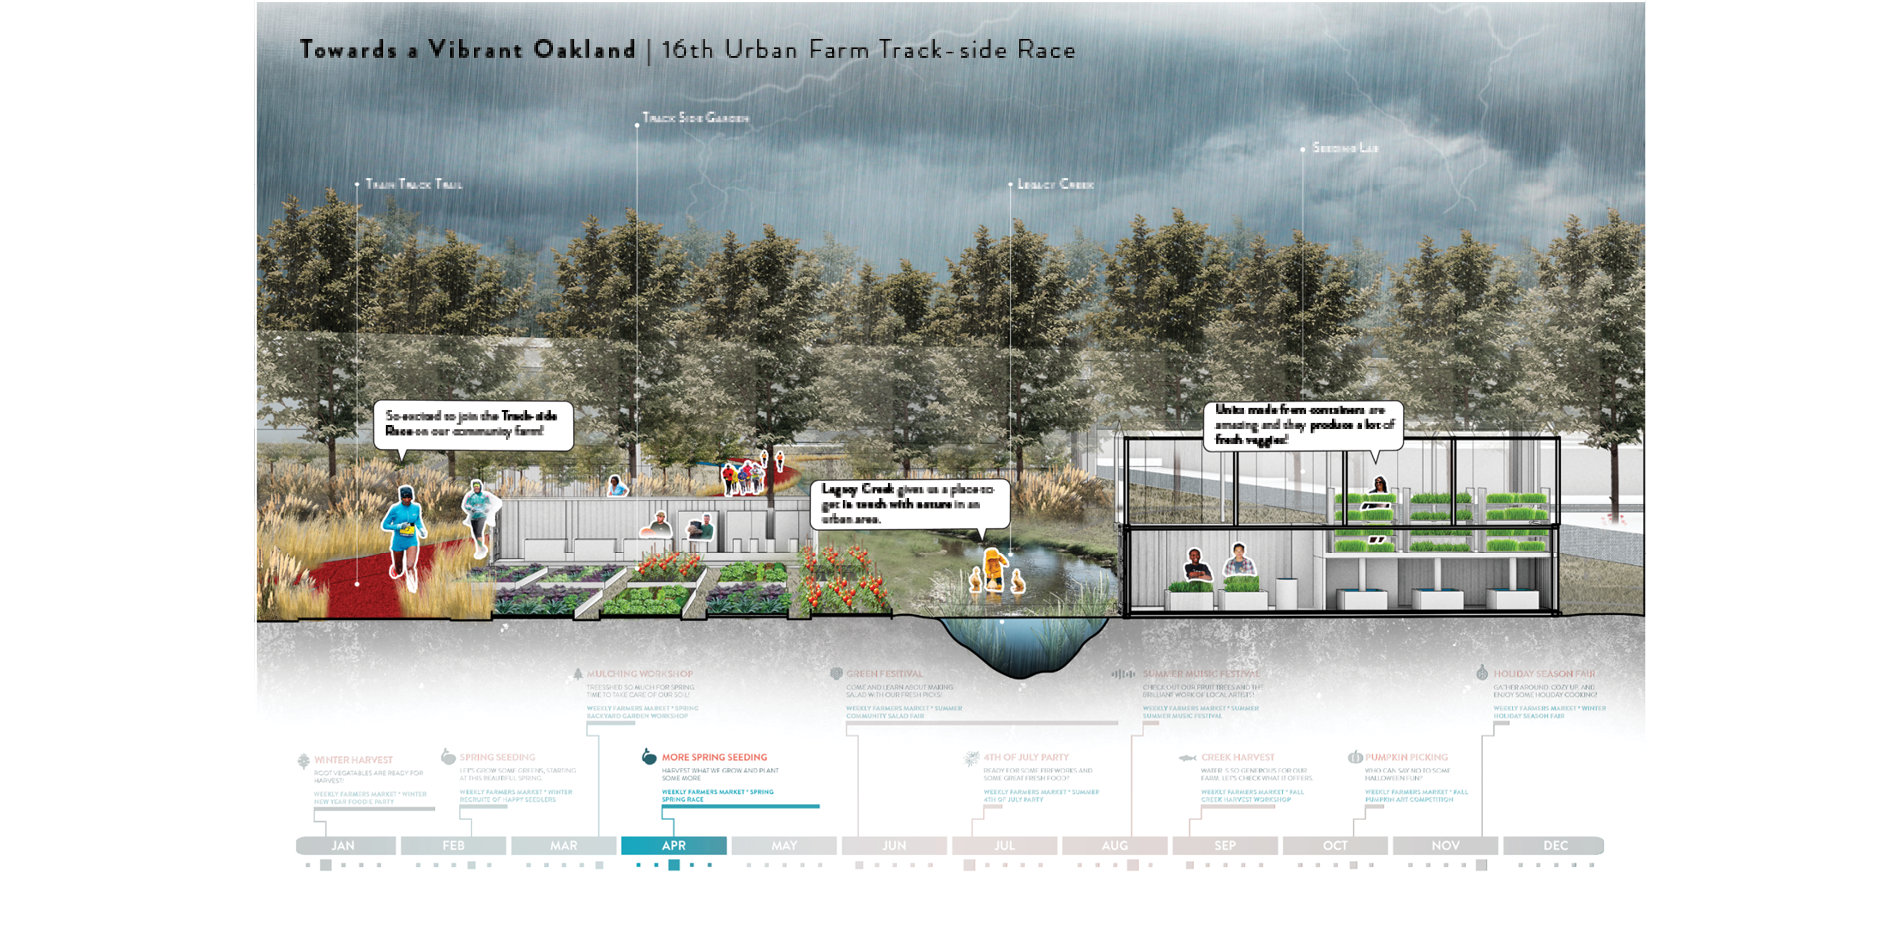 14) Towards a Vibrant Oakland | 16th Urban Farm Track-side Race